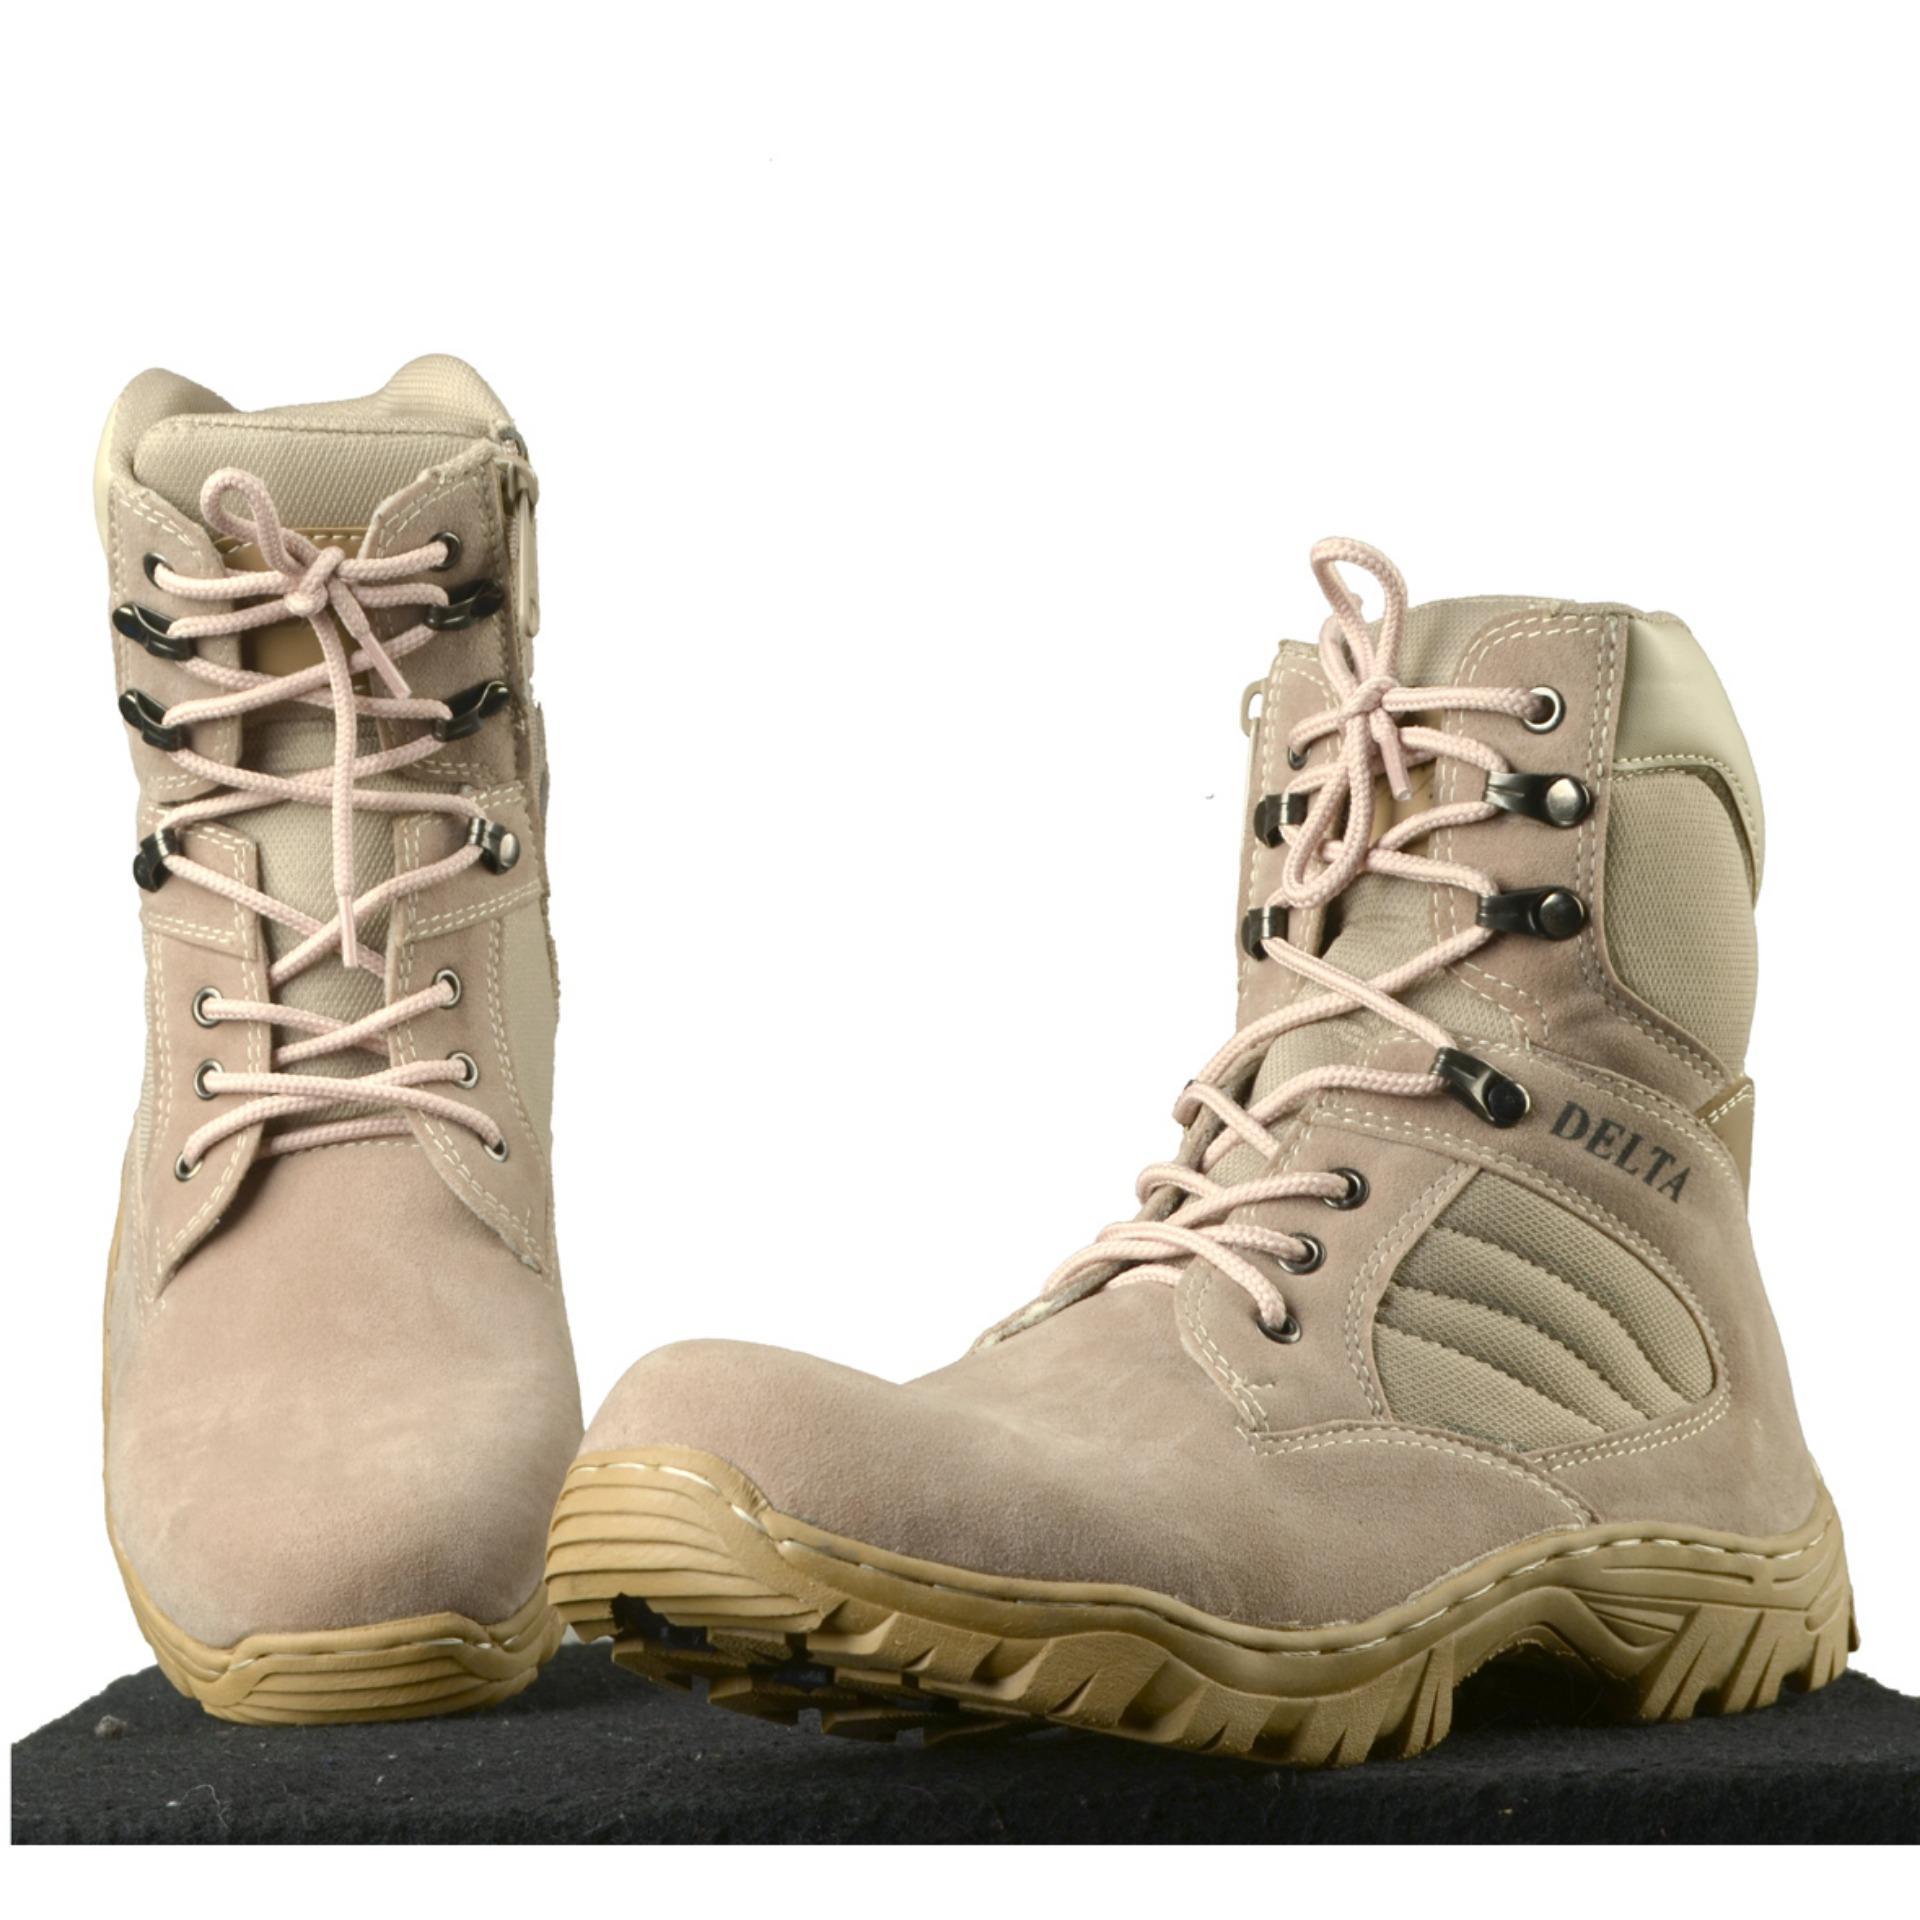 Cek Harga Baru Promo Sepatu Boots Safety Delta Tactical Army Tni Pdl Arboo Tracking Krem